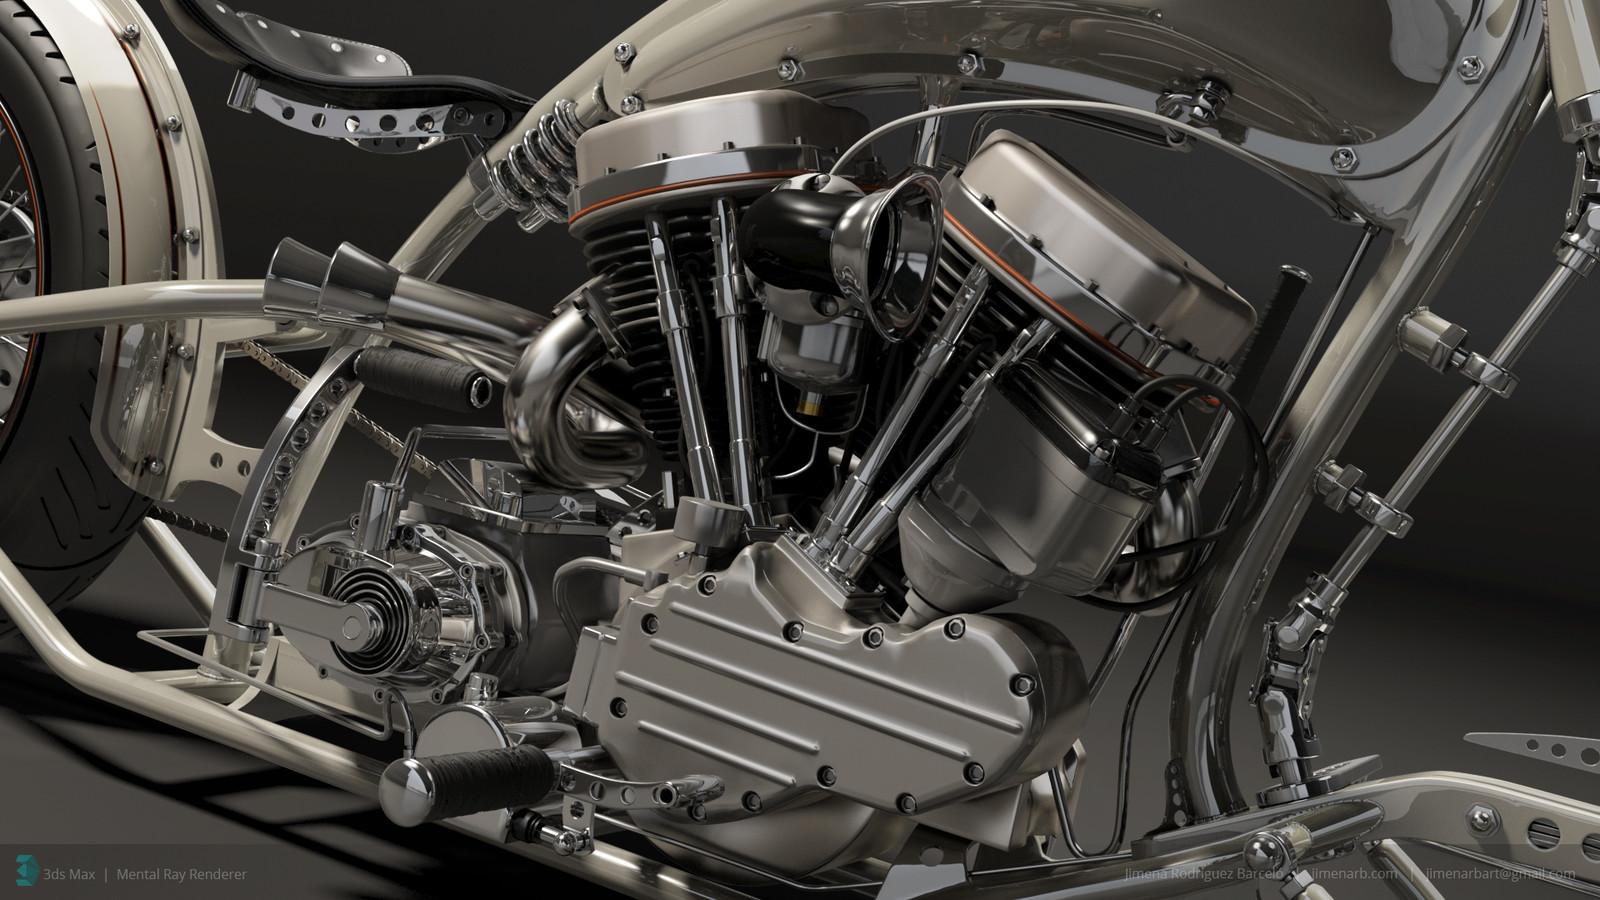 Swingshot Motorcycle